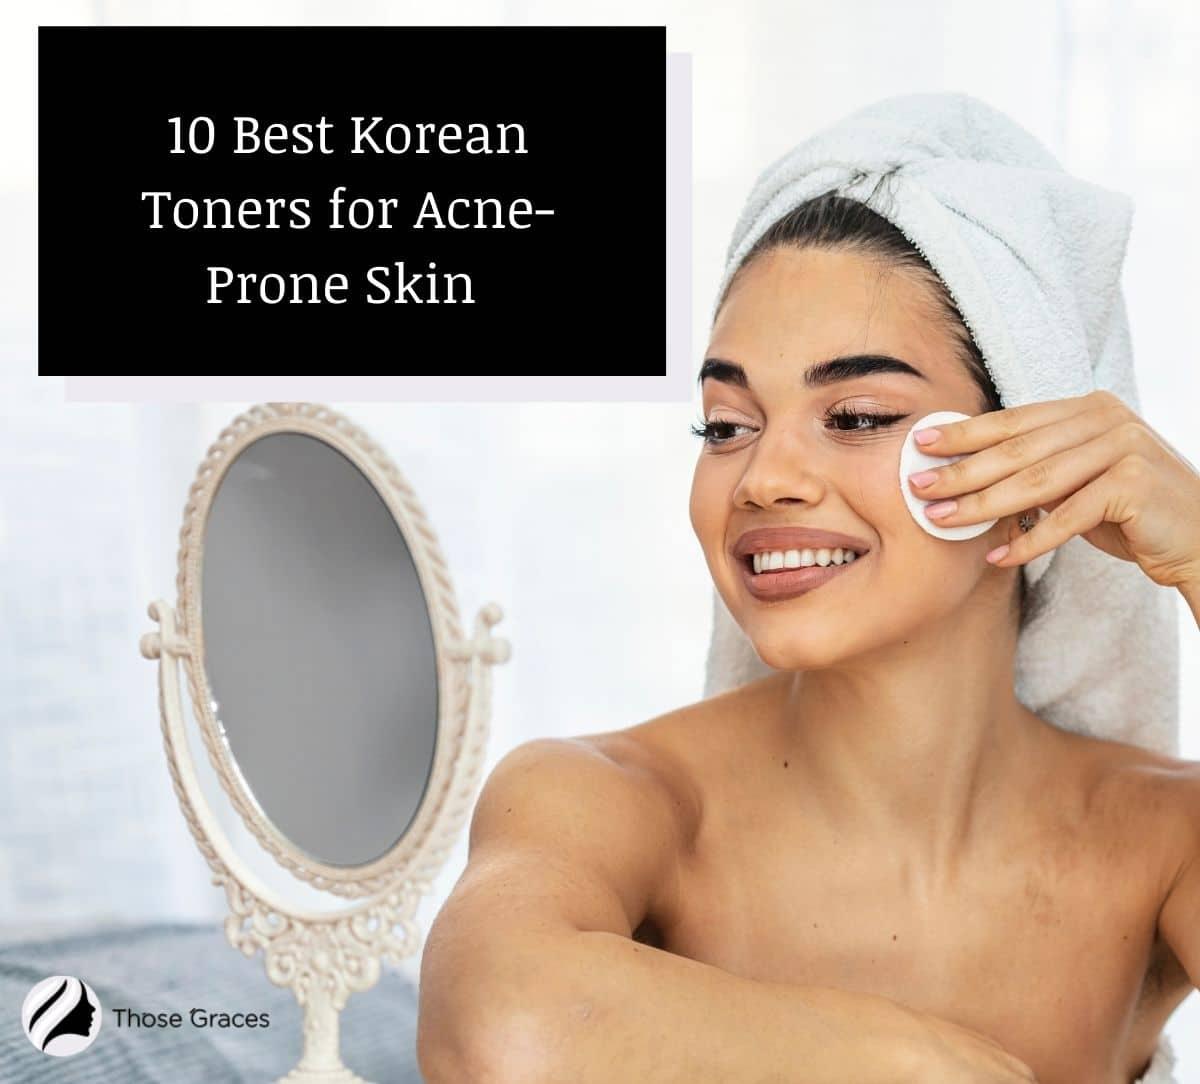 woman using the best Korean toner for acne prone skin